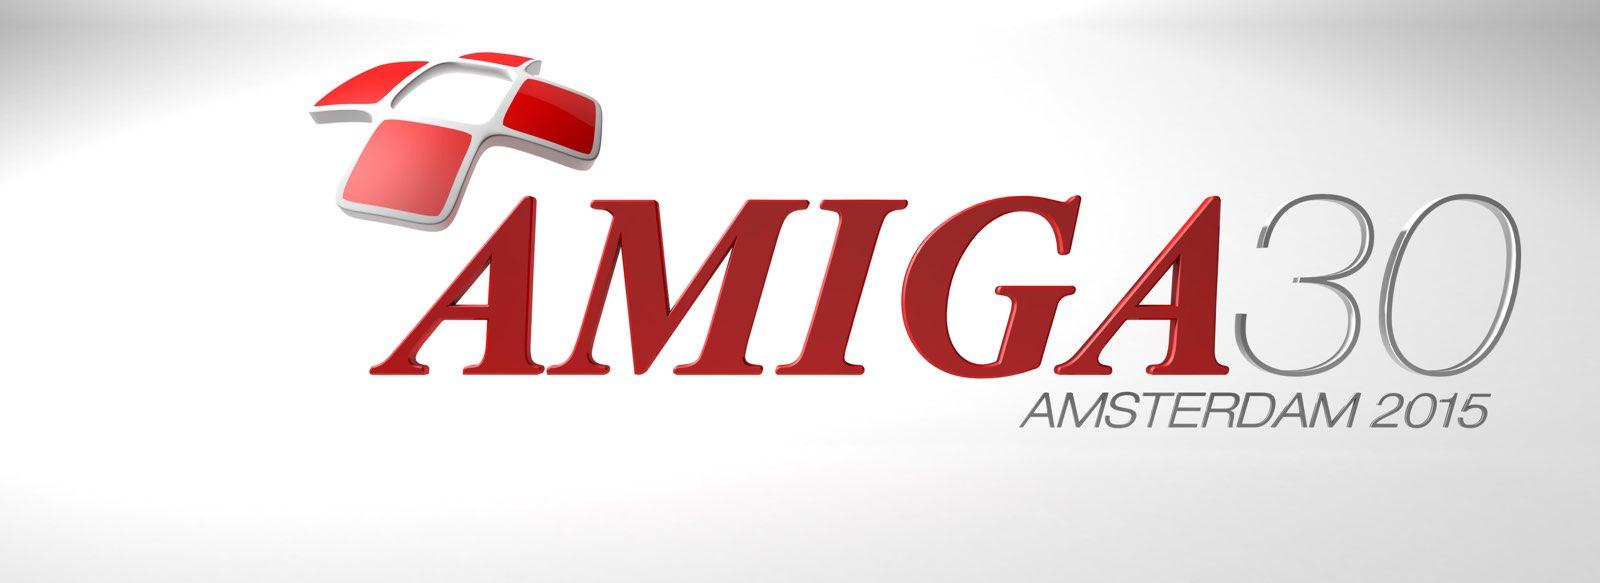 Amiga 30 years